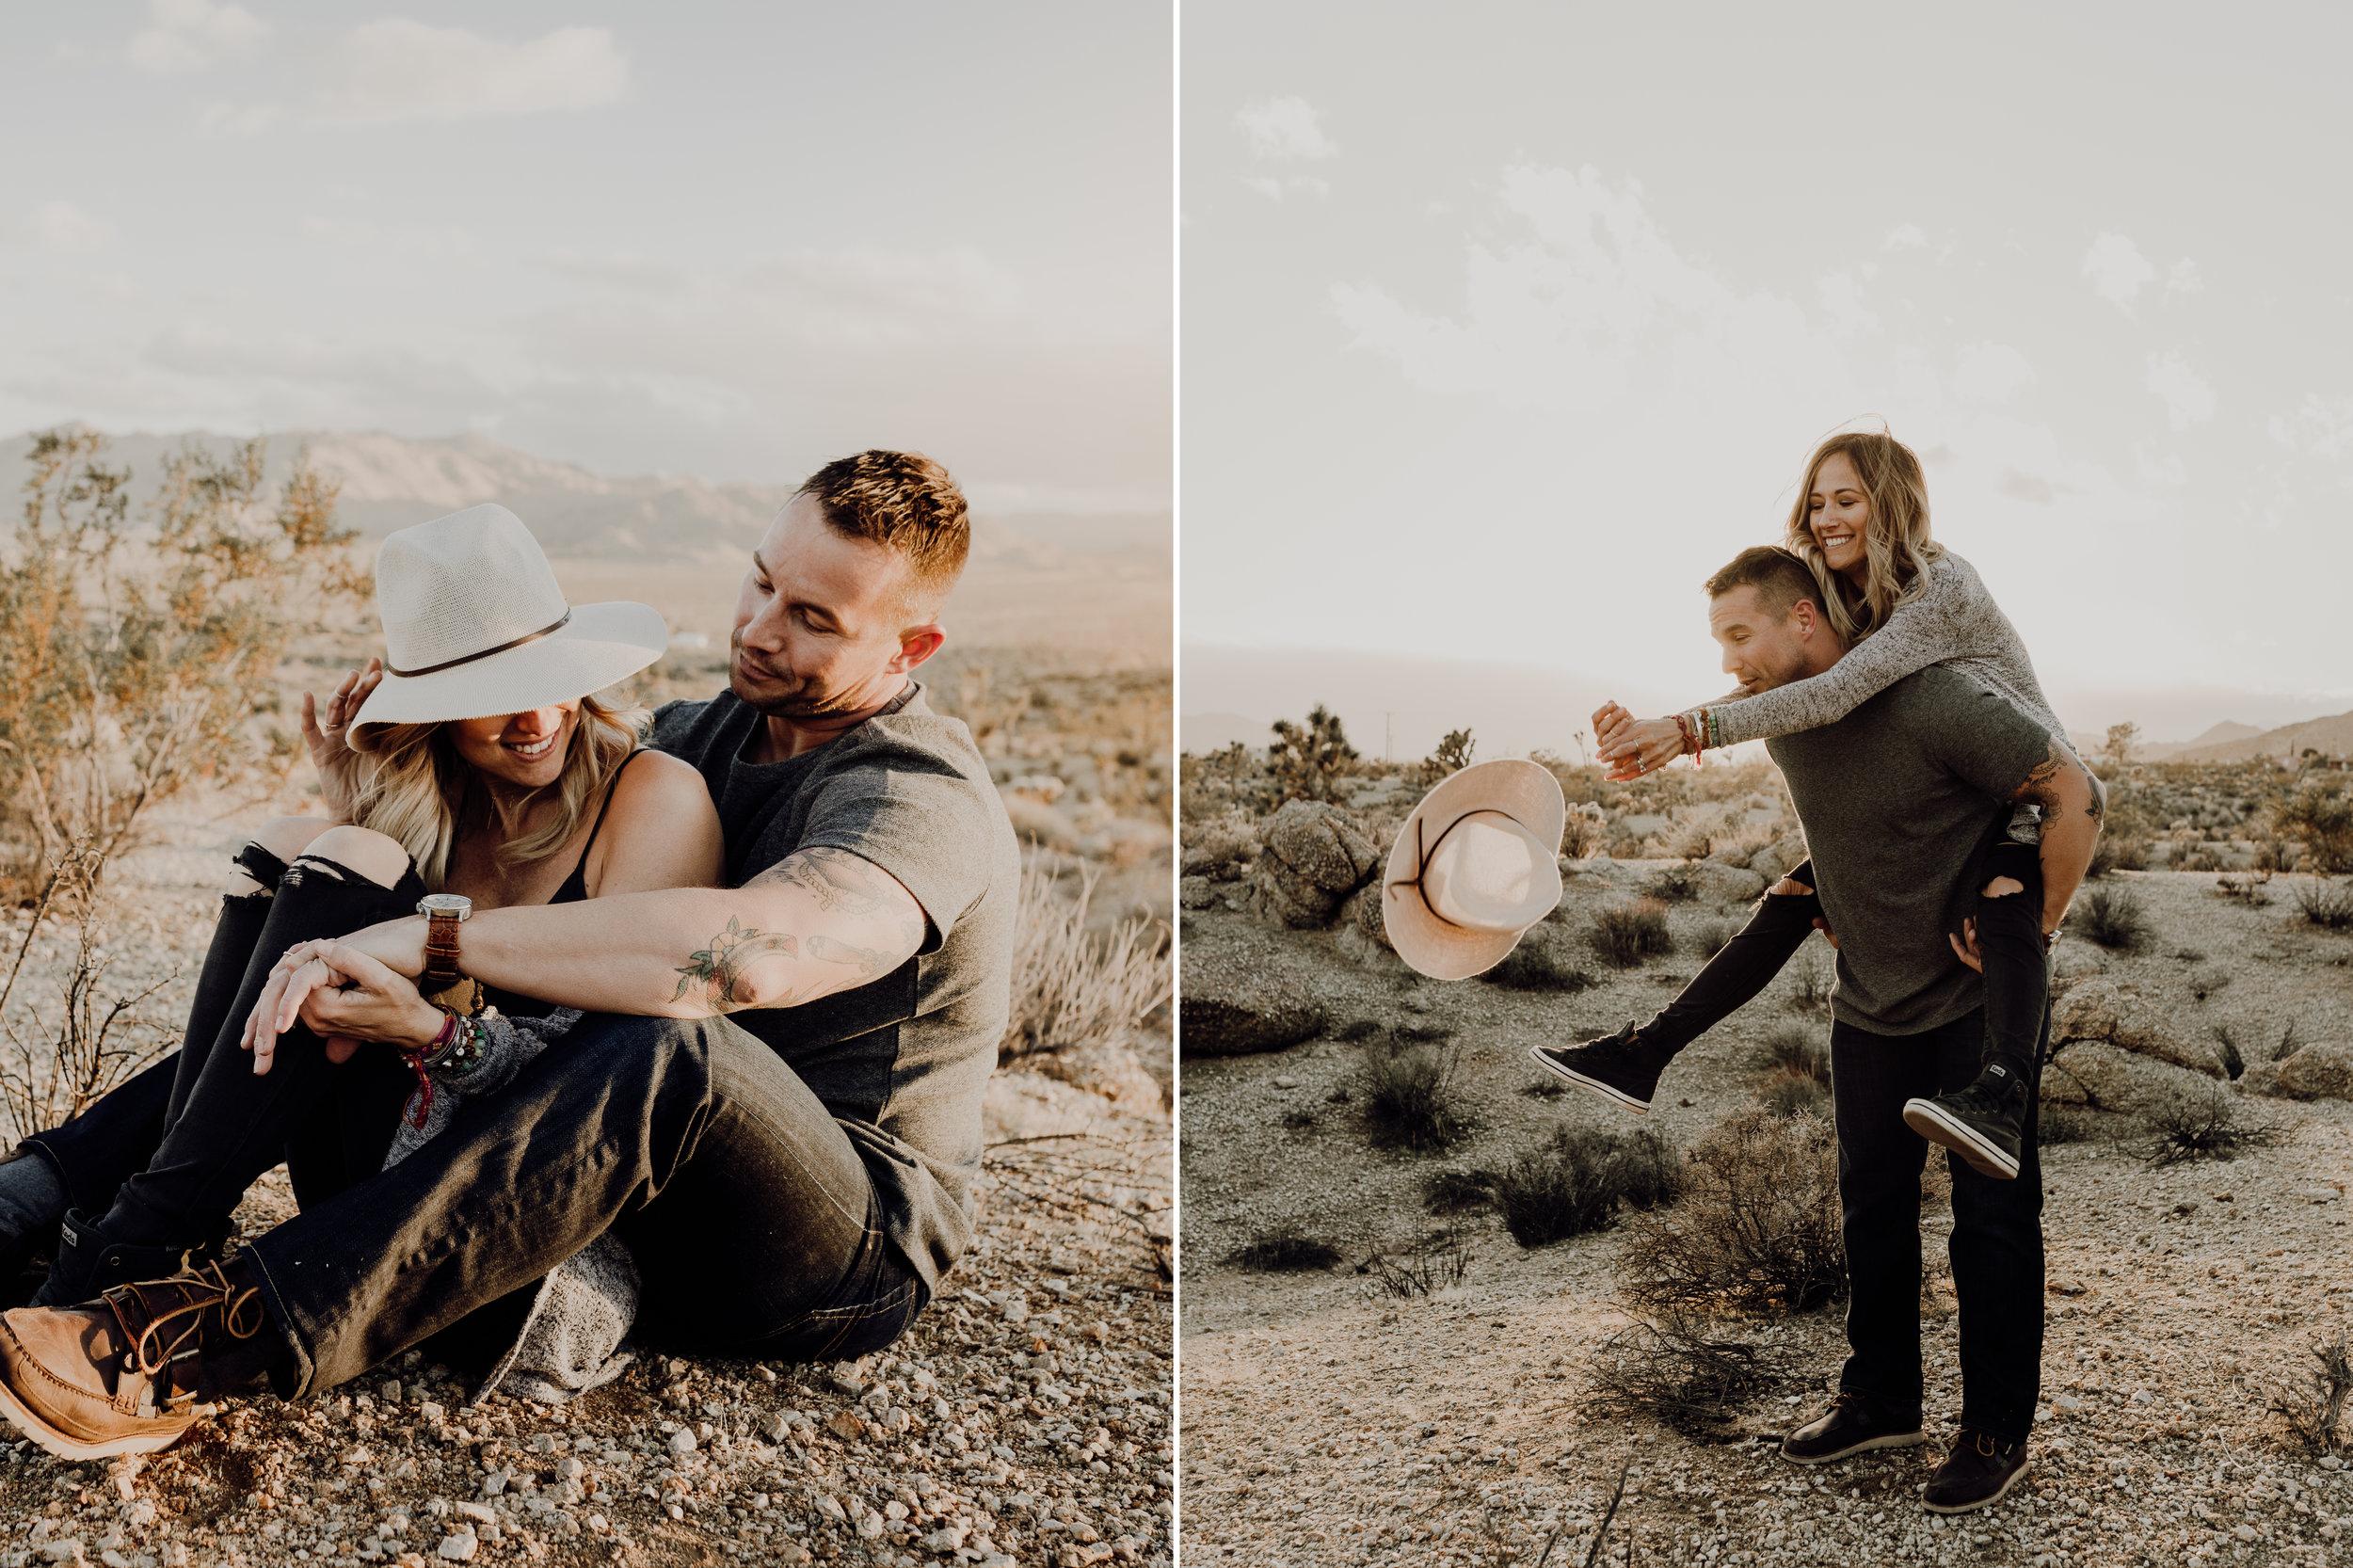 kristen giles photography - wedding photographer - joshua tree ca engagement session 1.jpg